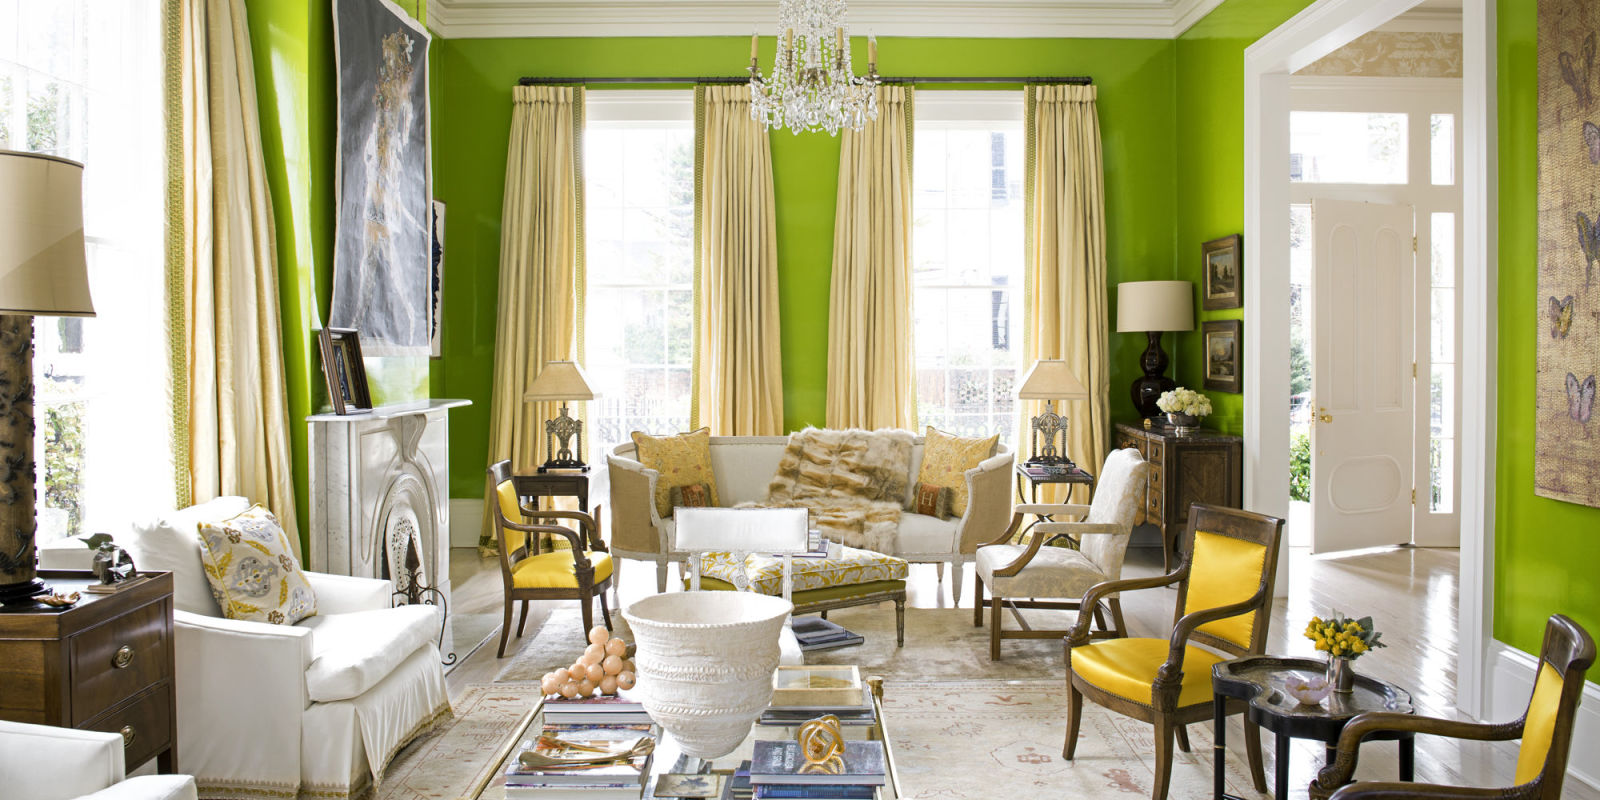 15 X 18 Living Room Ideas Zion Star